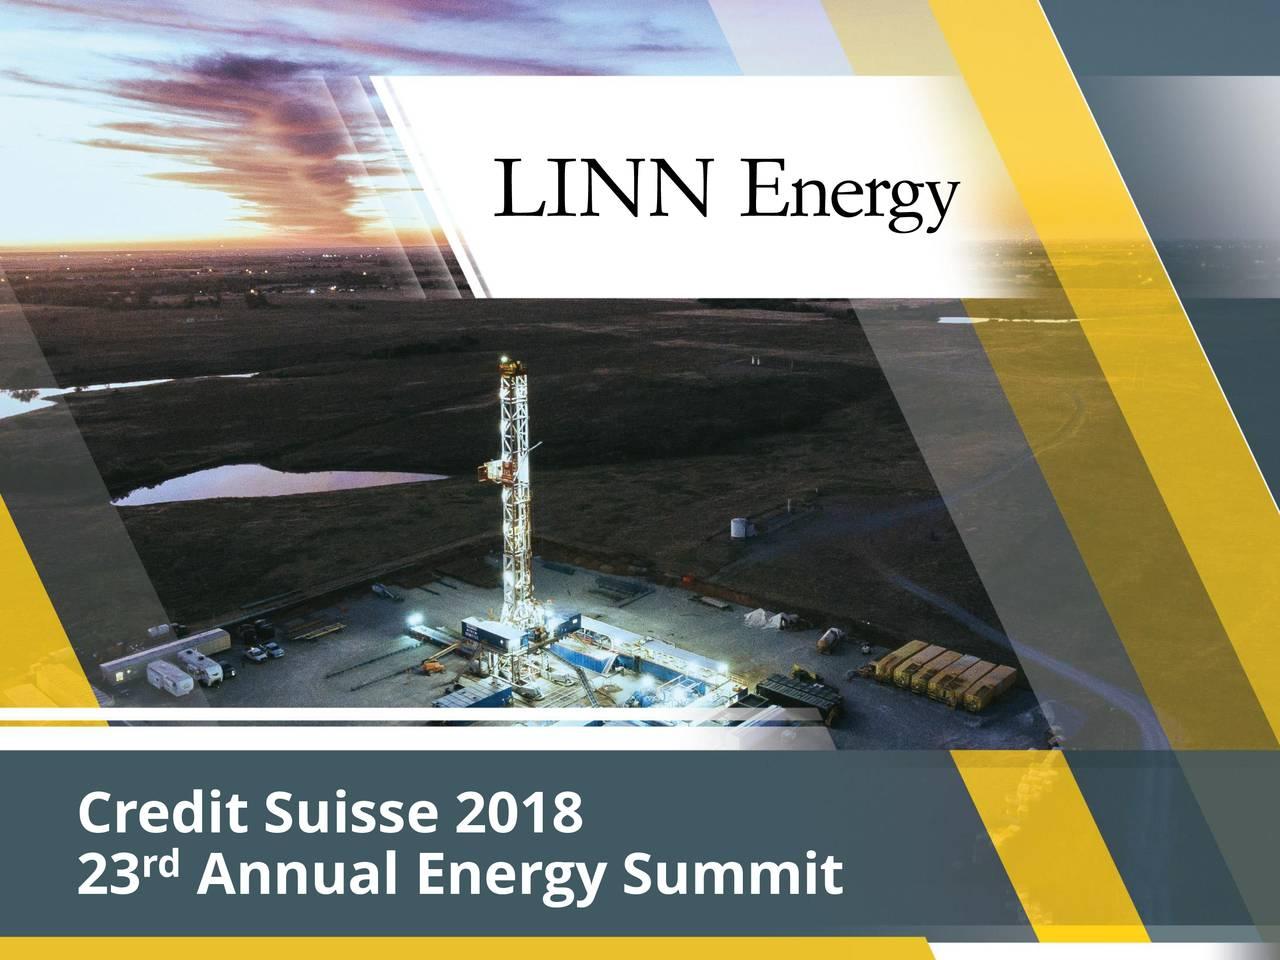 rd 23 Annual Energy Summit